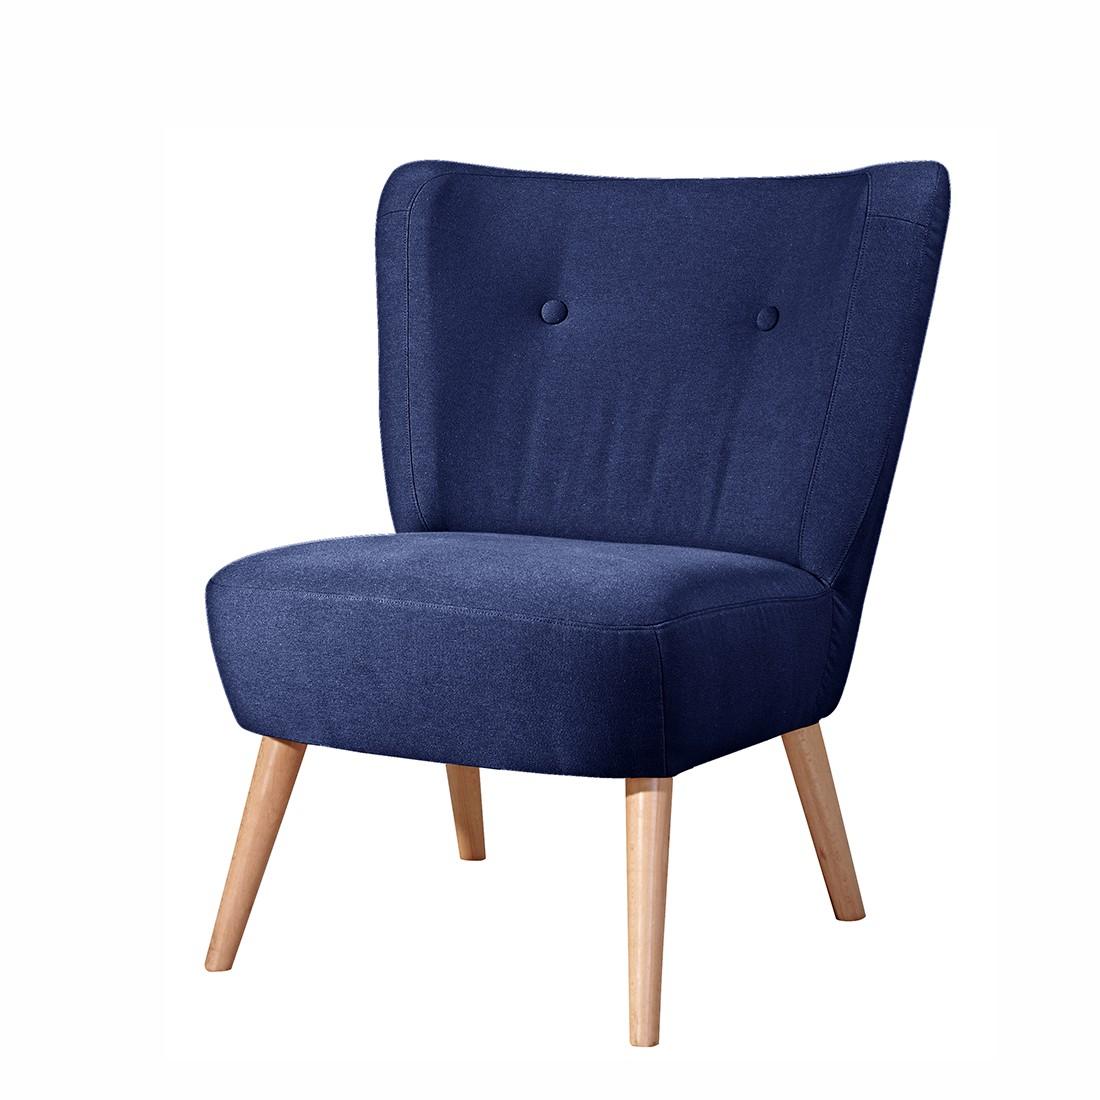 sessel fergie stoff dunkelblau leinenoptik re concept m bel bestellen. Black Bedroom Furniture Sets. Home Design Ideas